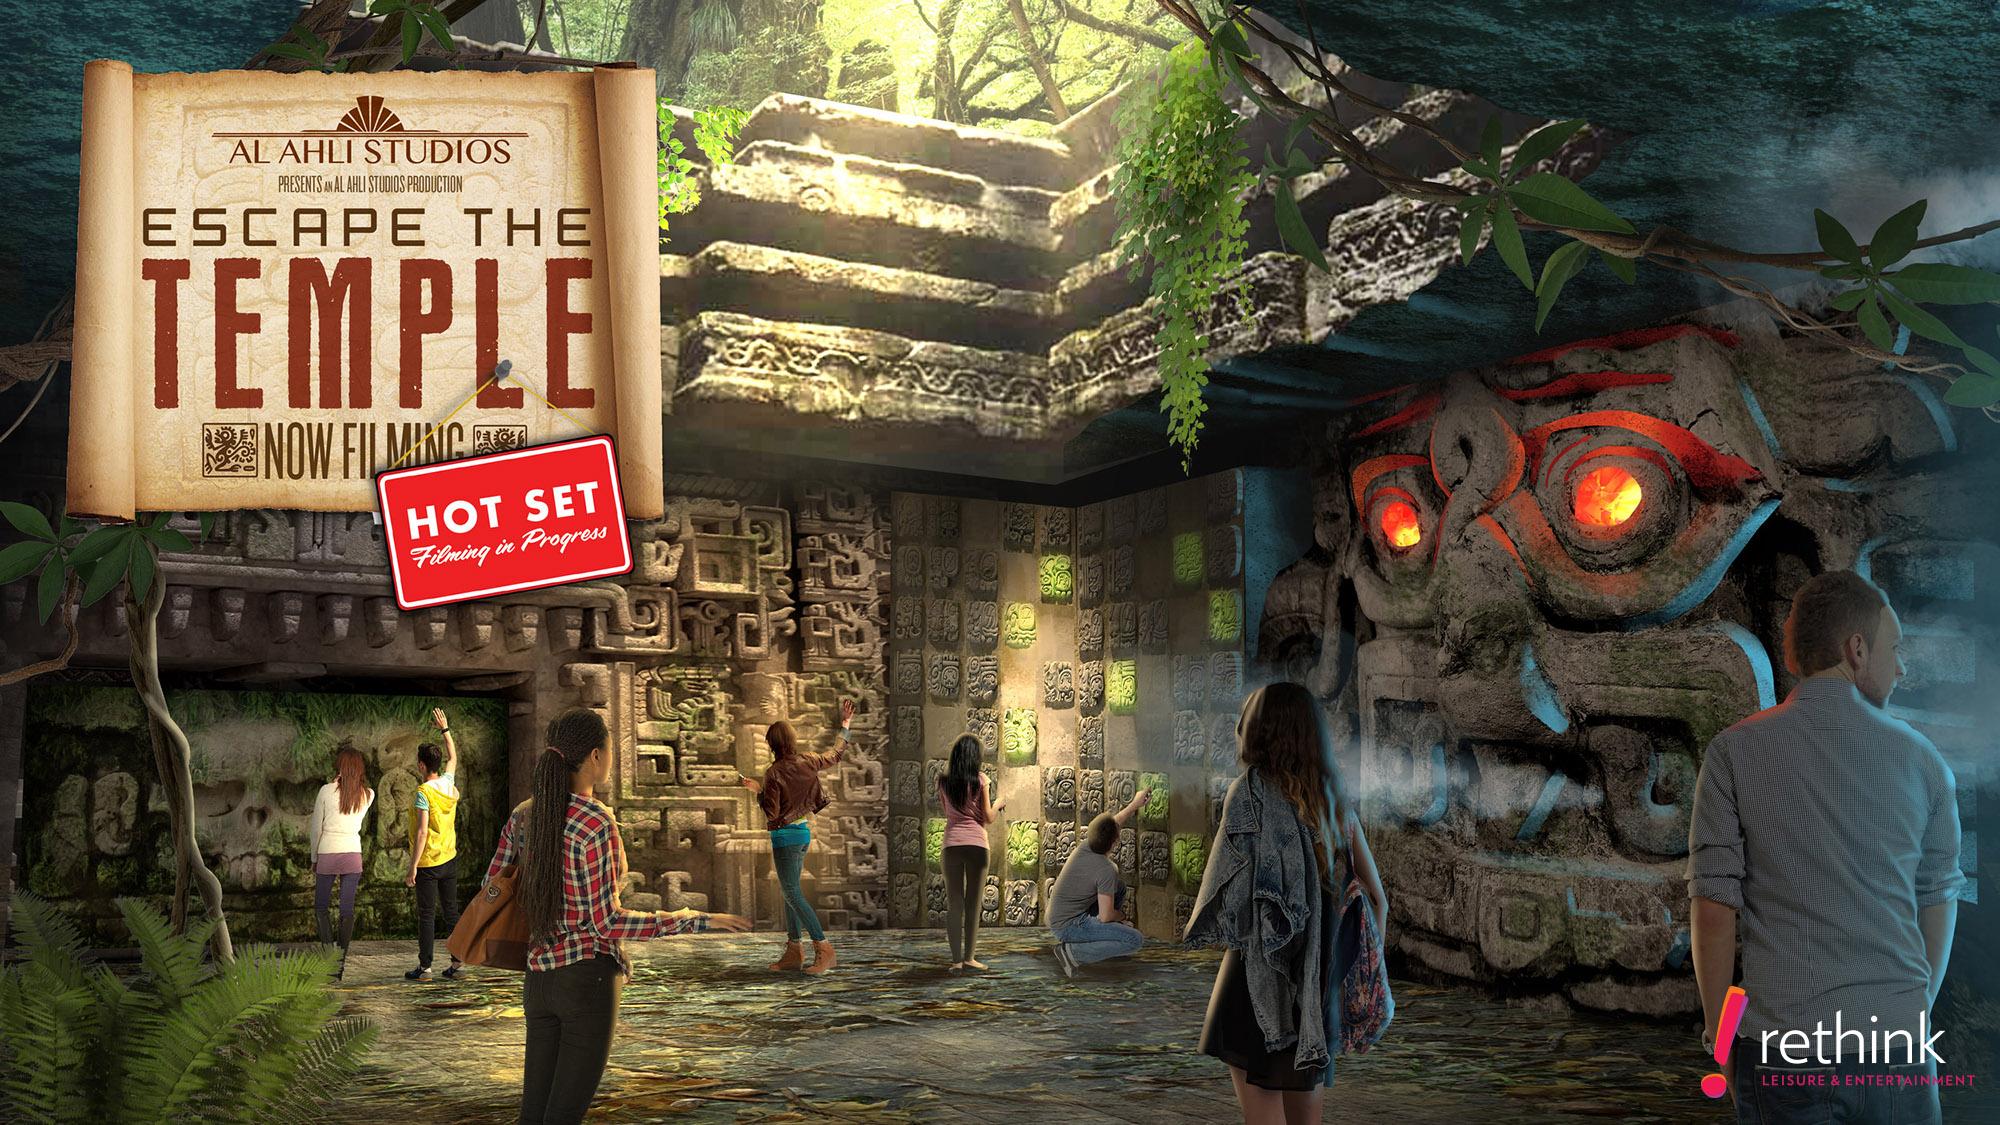 jungle-temple-1130.jpg